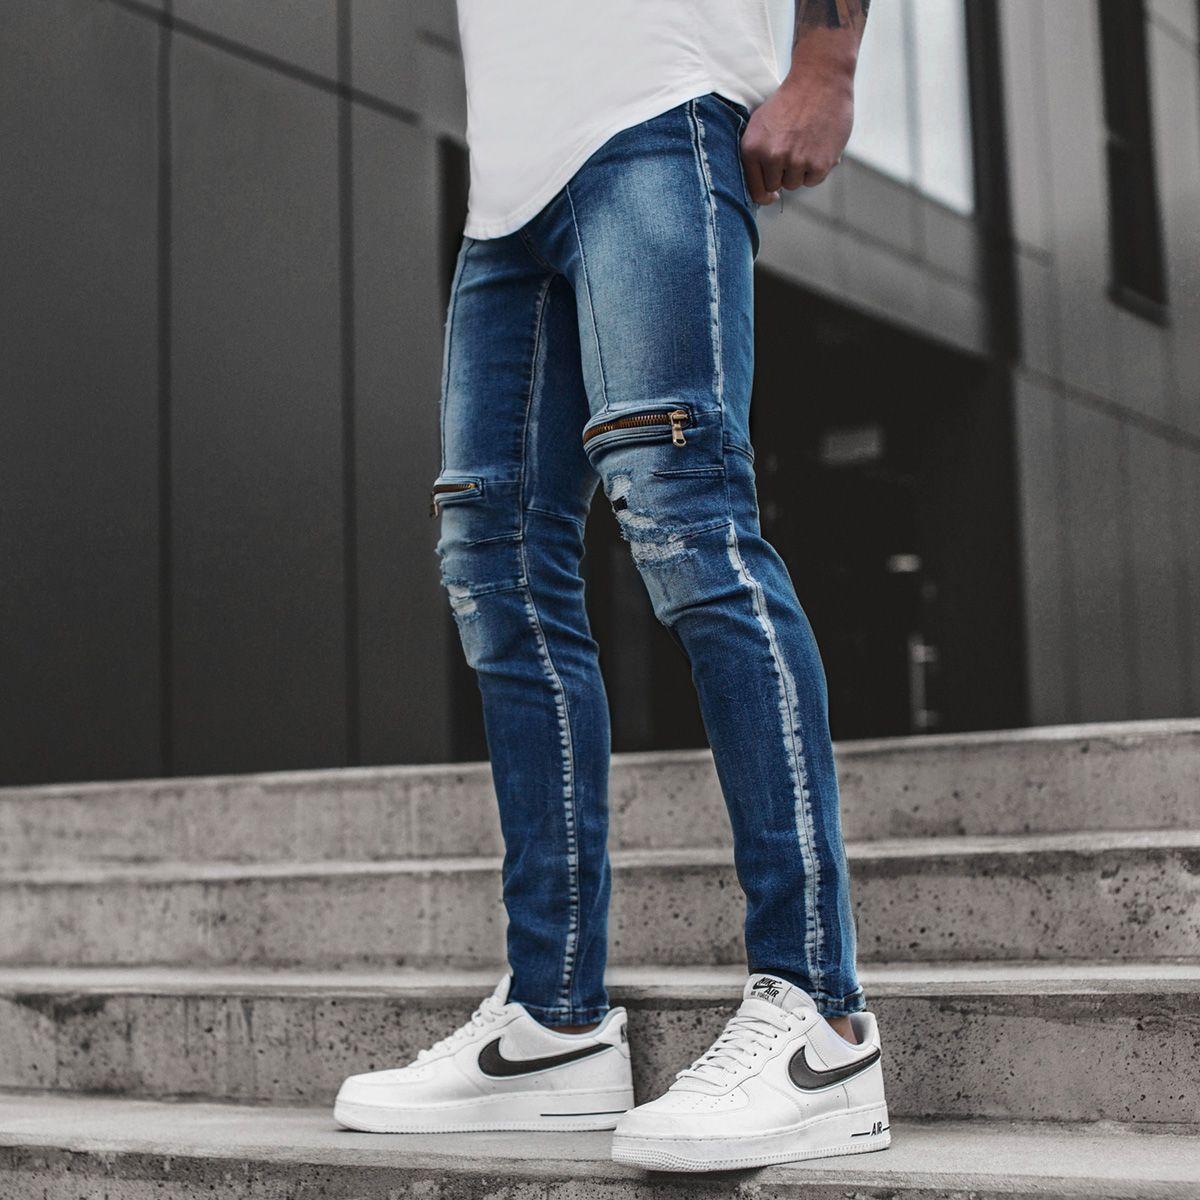 Ozoneepl Newstuff Look Outfit Instpic Me Modameska Ootd Lotd Casual Stylizacja Misterpolski Mensfashion Menswear Str Skinny Jeans Skinny Fashion